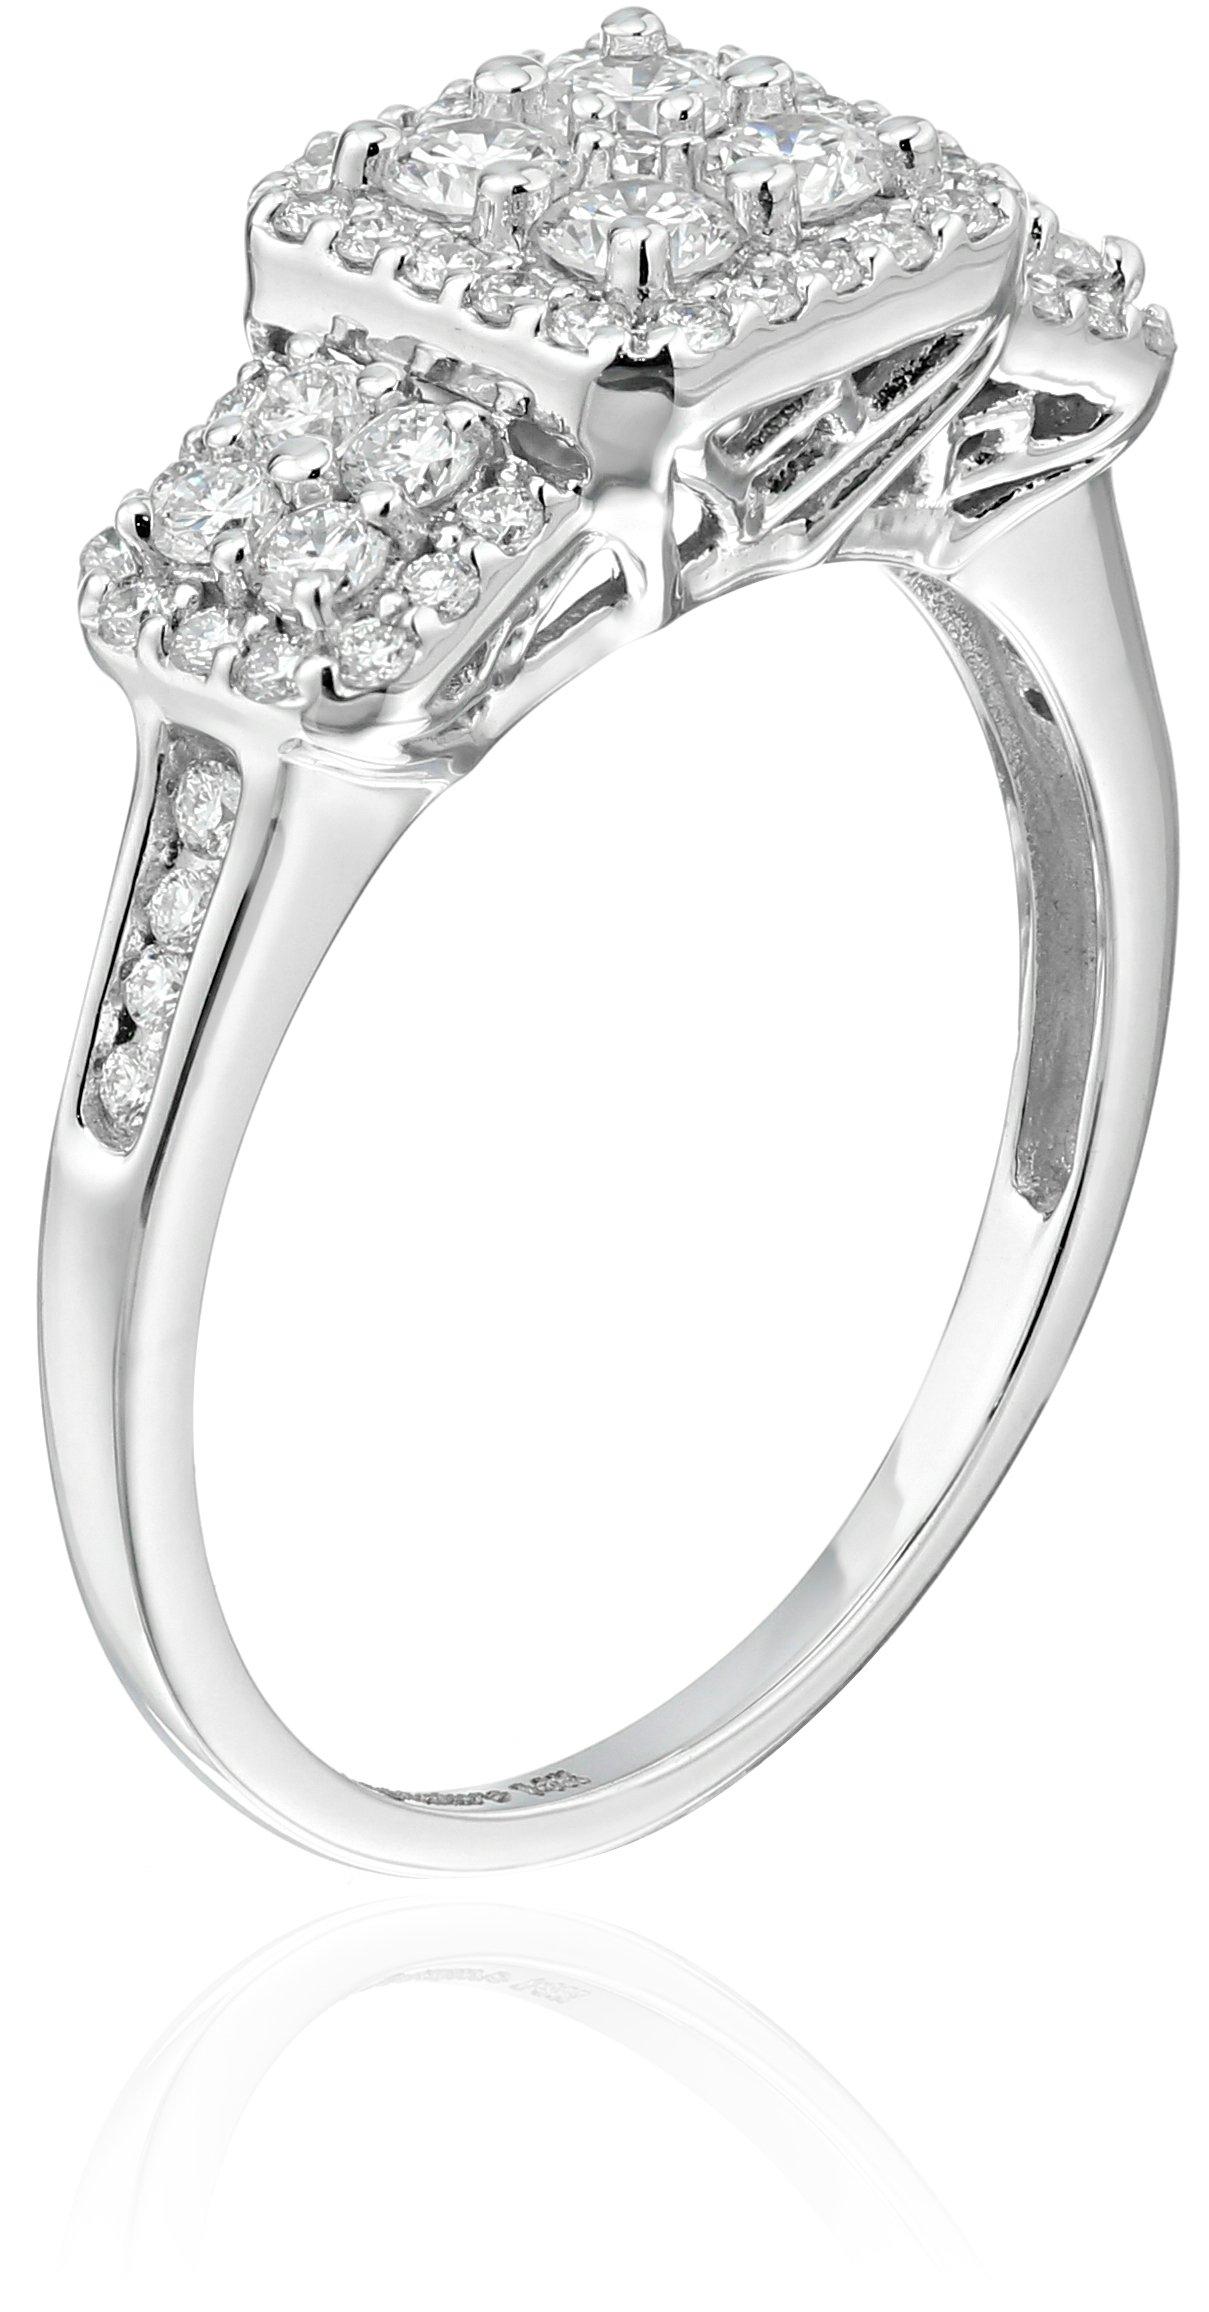 Keepsake Signature 14k White Gold Diamond Three-Stone Engagement Ring (1cttw, H-I Color, I1 Clarity), Size 7 by Amazon Collection (Image #2)